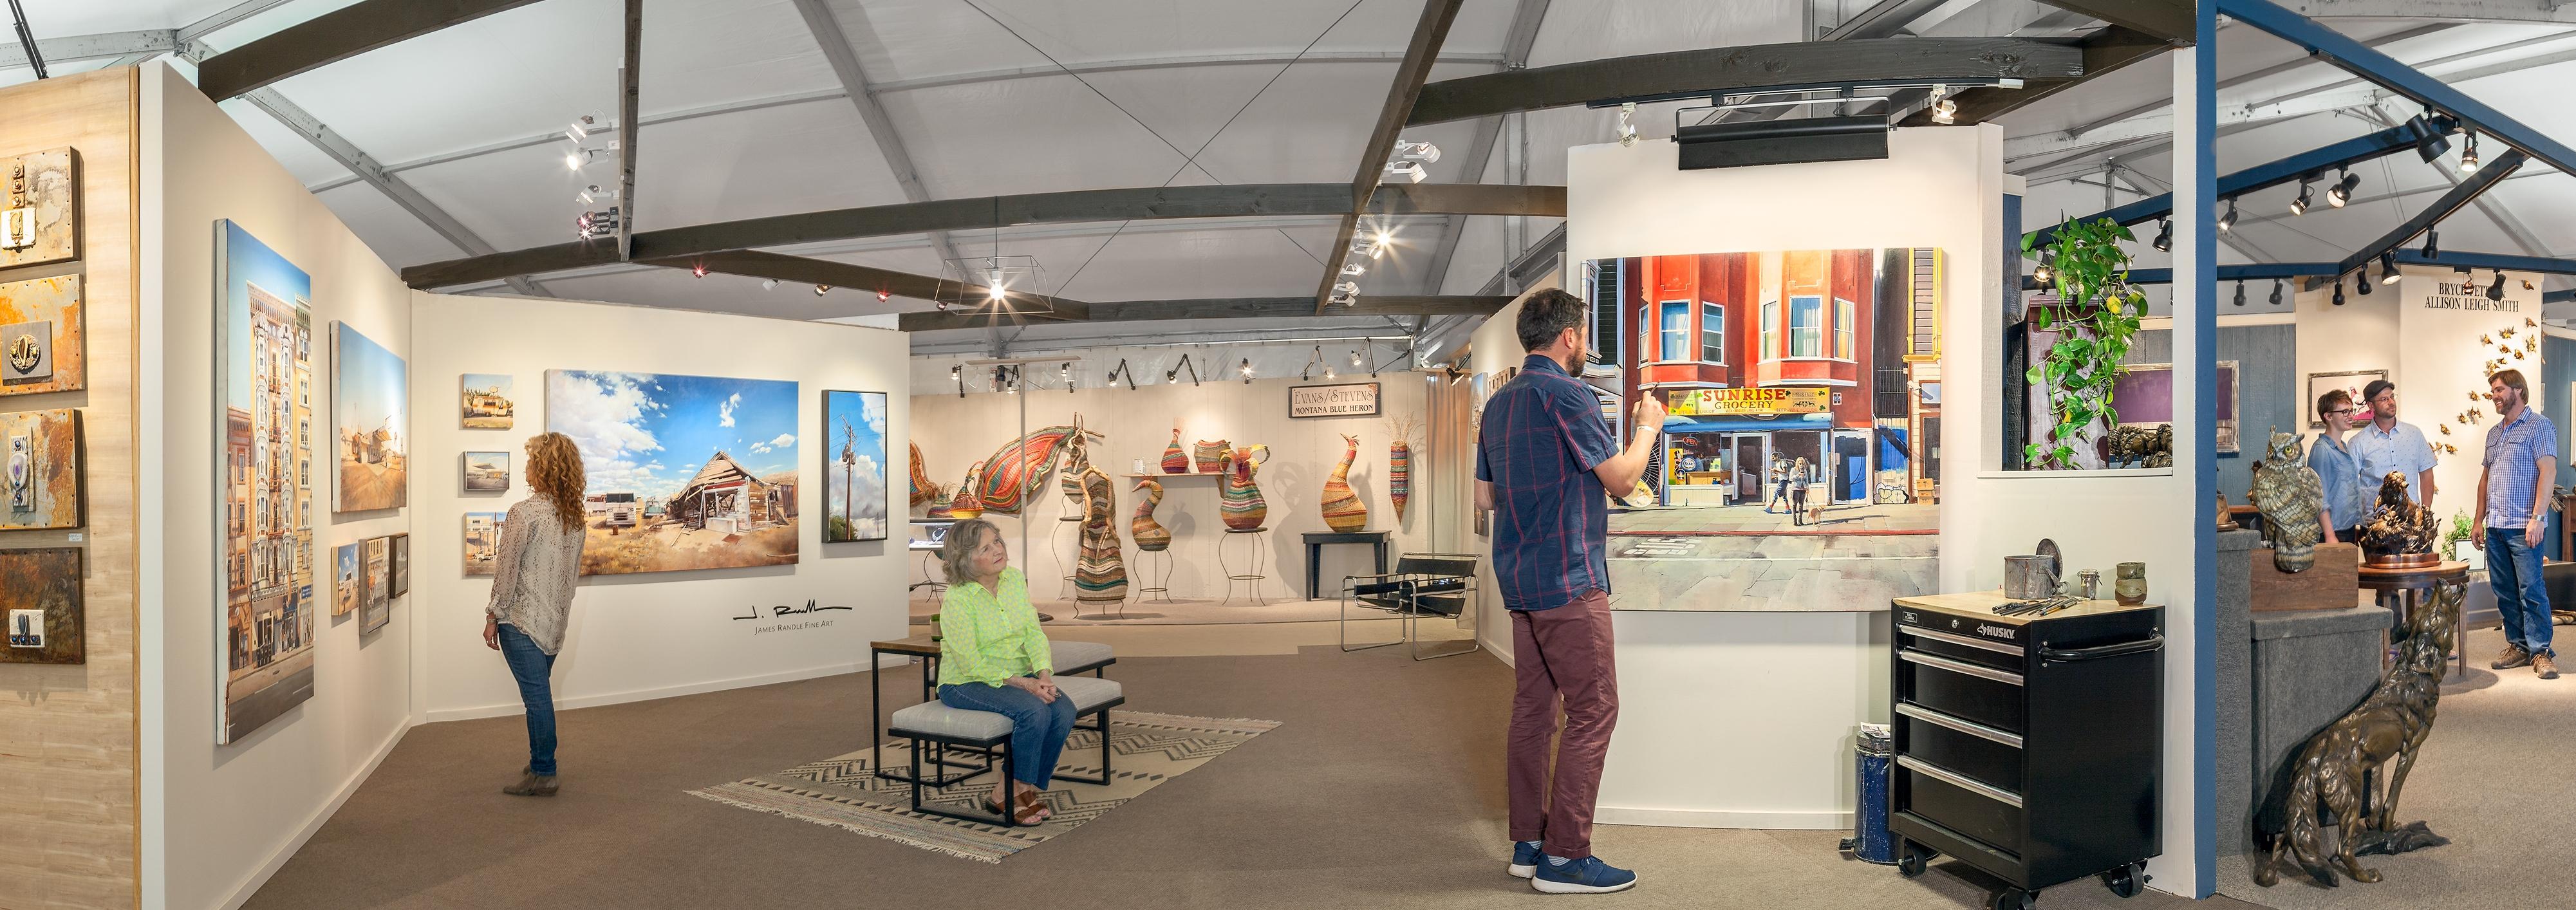 Scottsdale Art Galleries & Museums   Experience Scottsdale